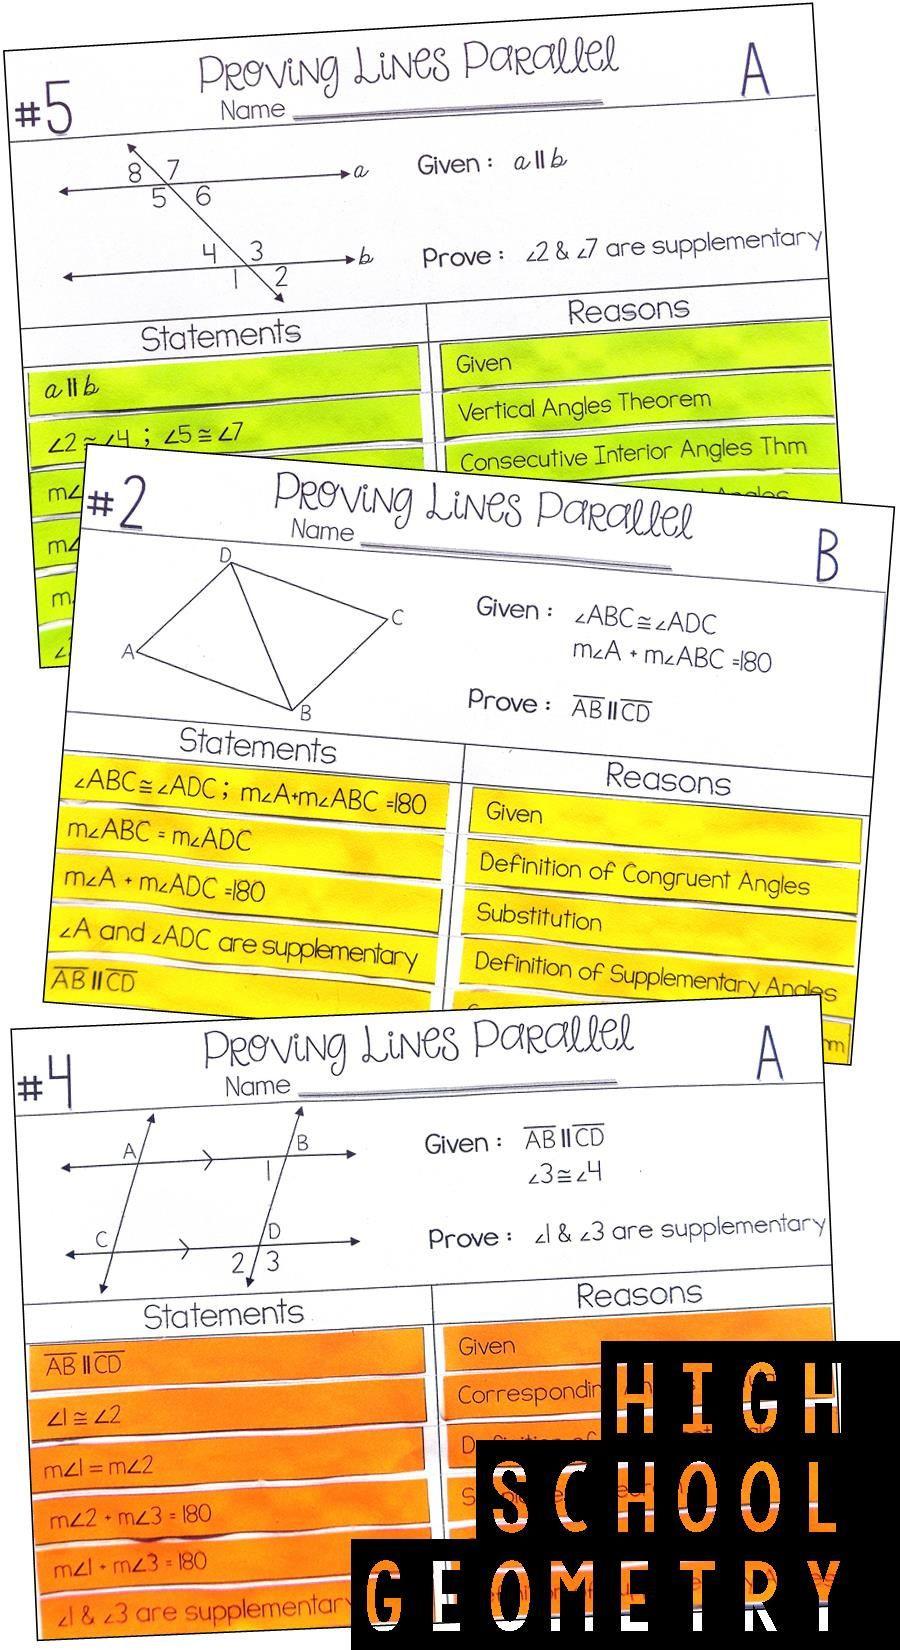 Proving Lines Parallel Worksheet